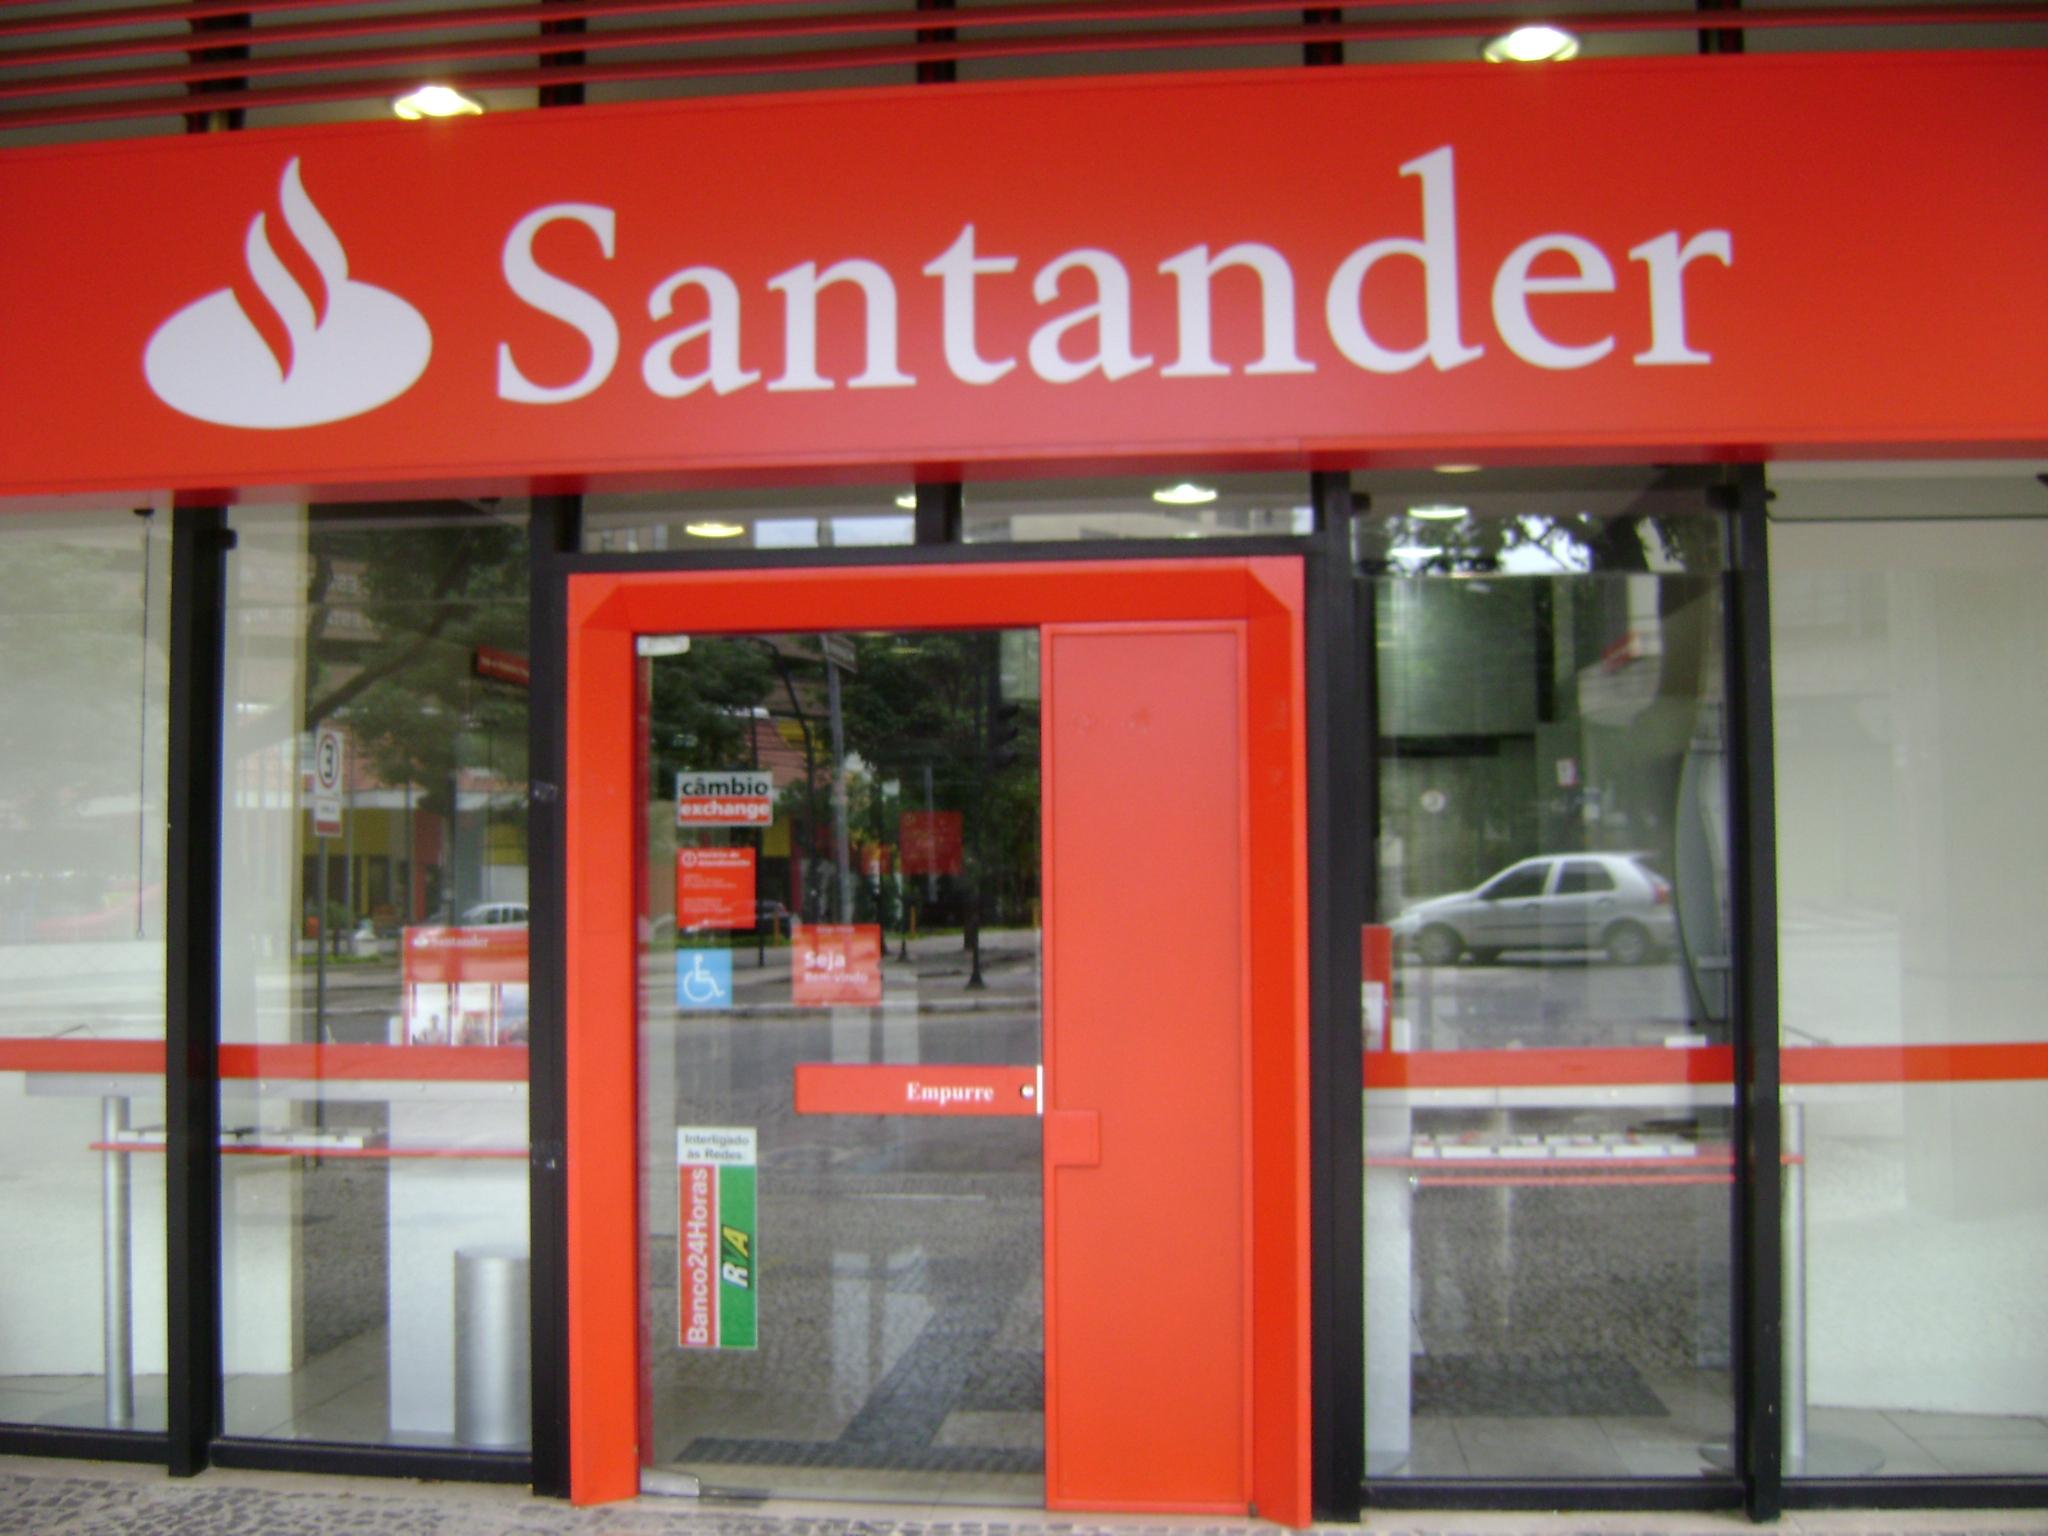 Banco santander phishing scam uncovered for Oficinas banco santander murcia